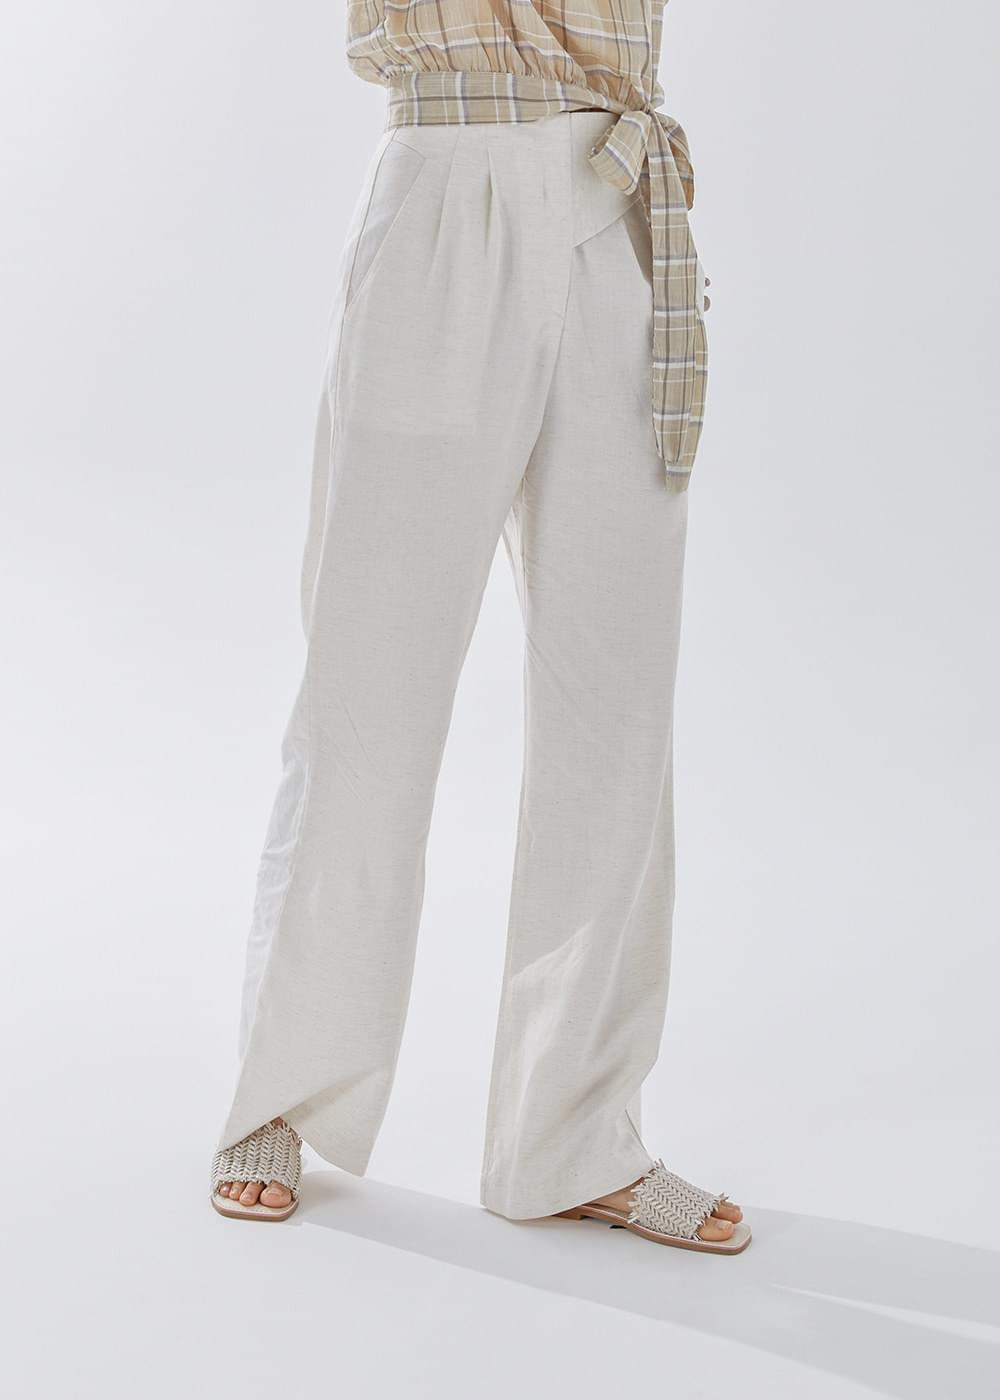 Linen wide slacks